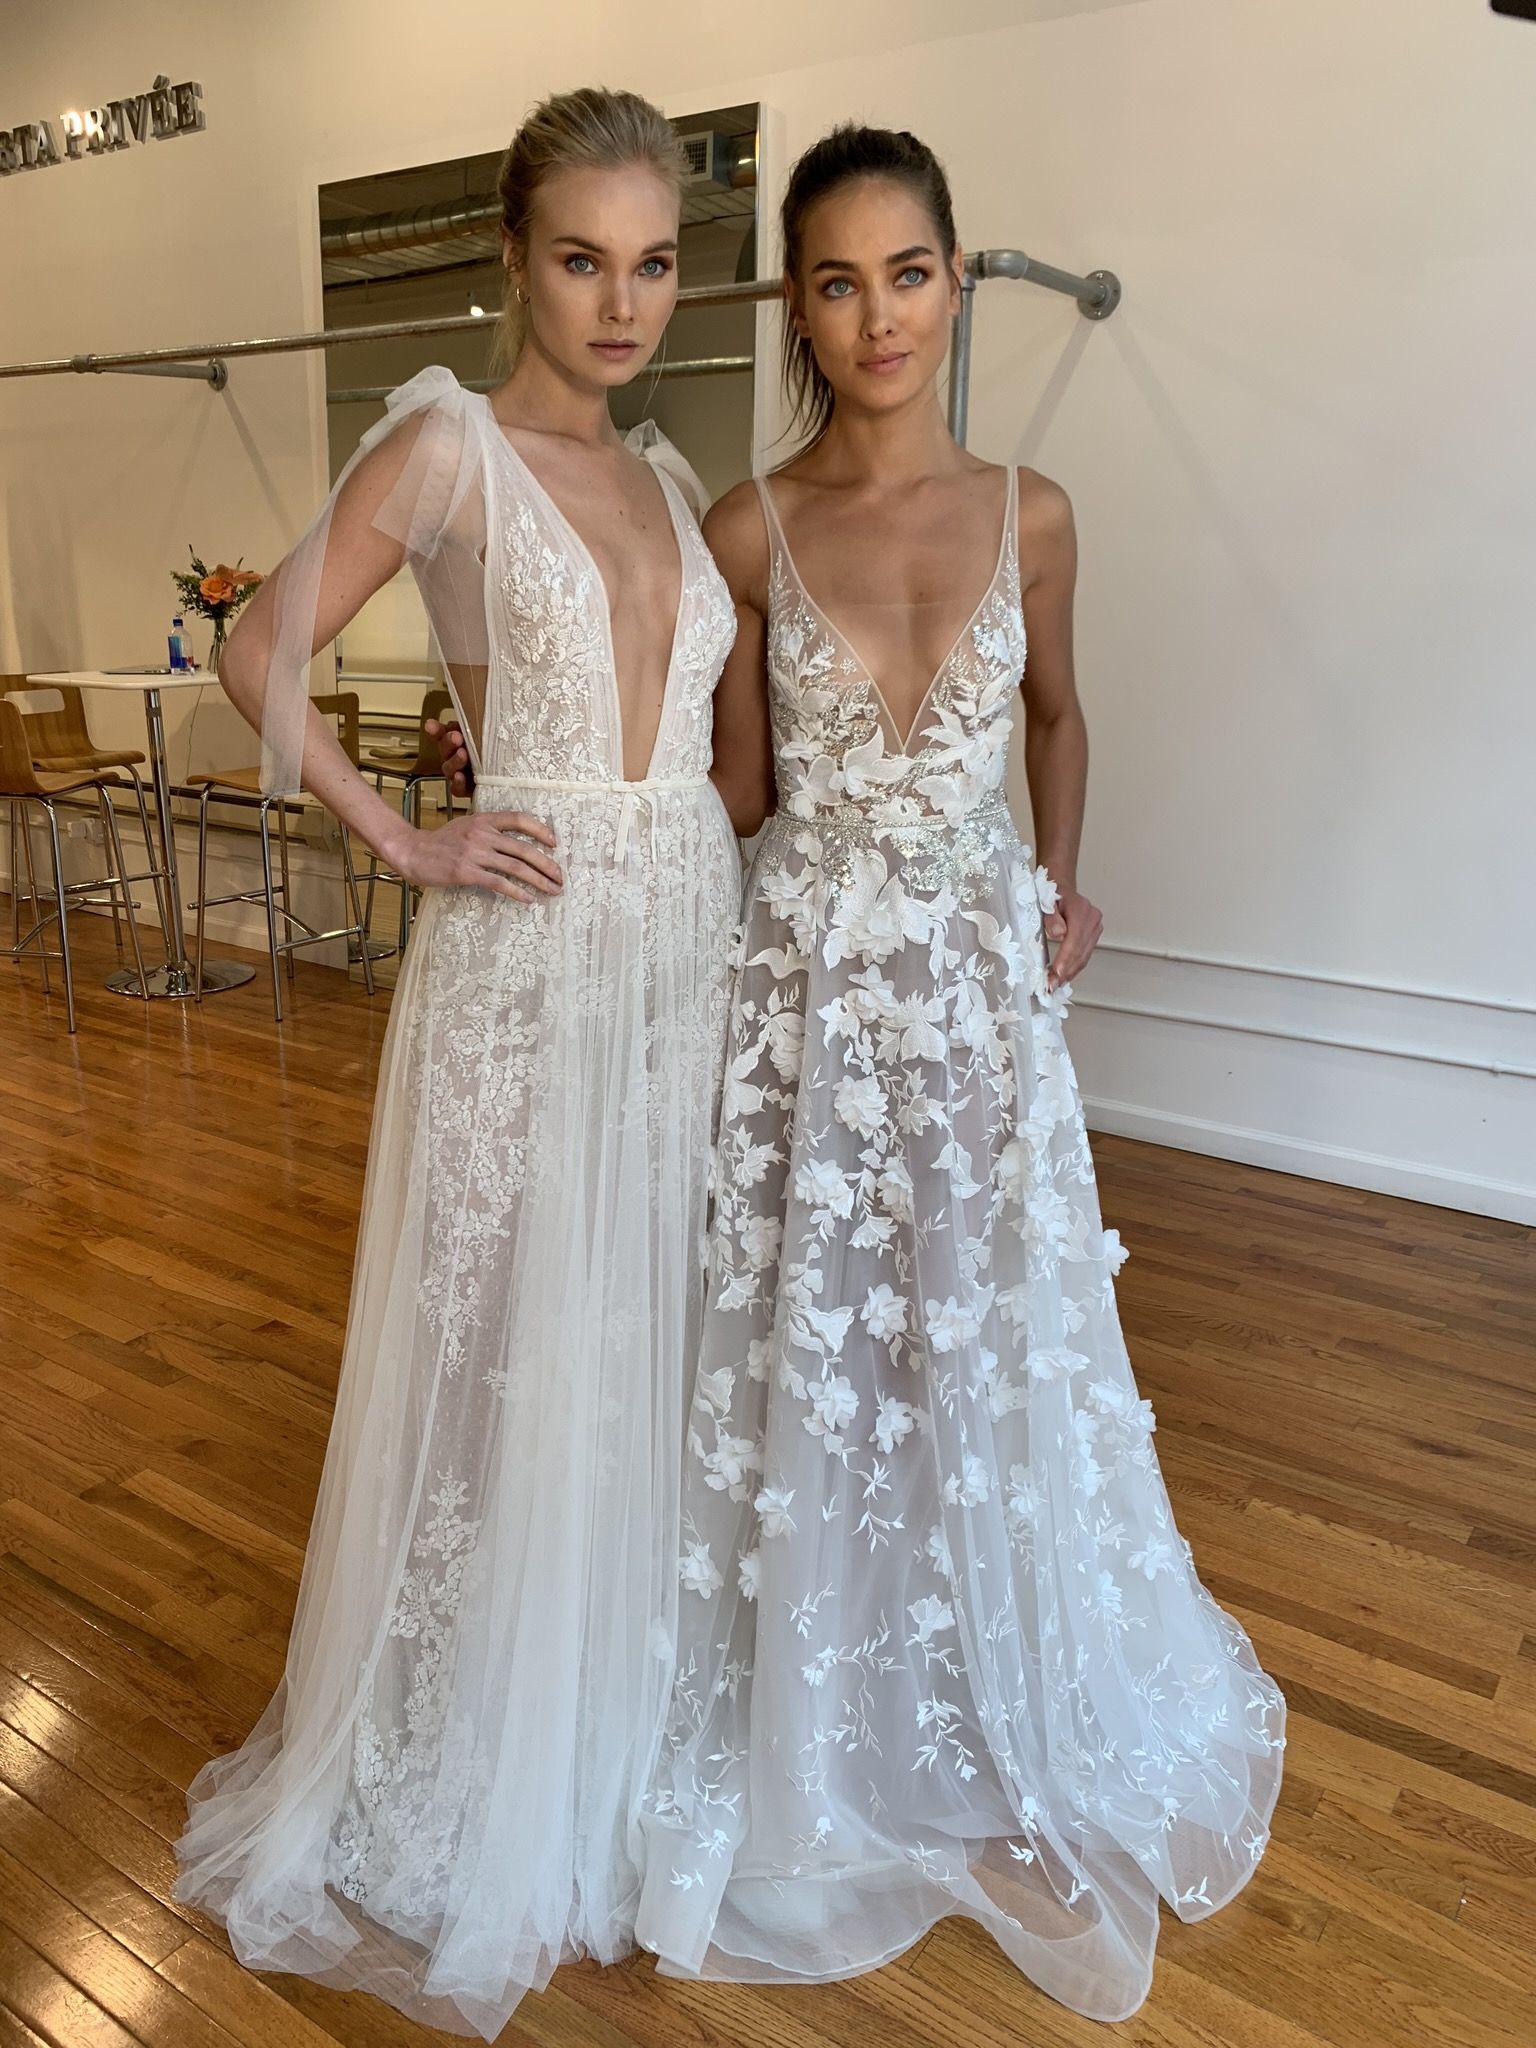 Lovella Bridal With Berta Bridal In Nyc Dresses Berta Bridal Wedding Dresses Lace